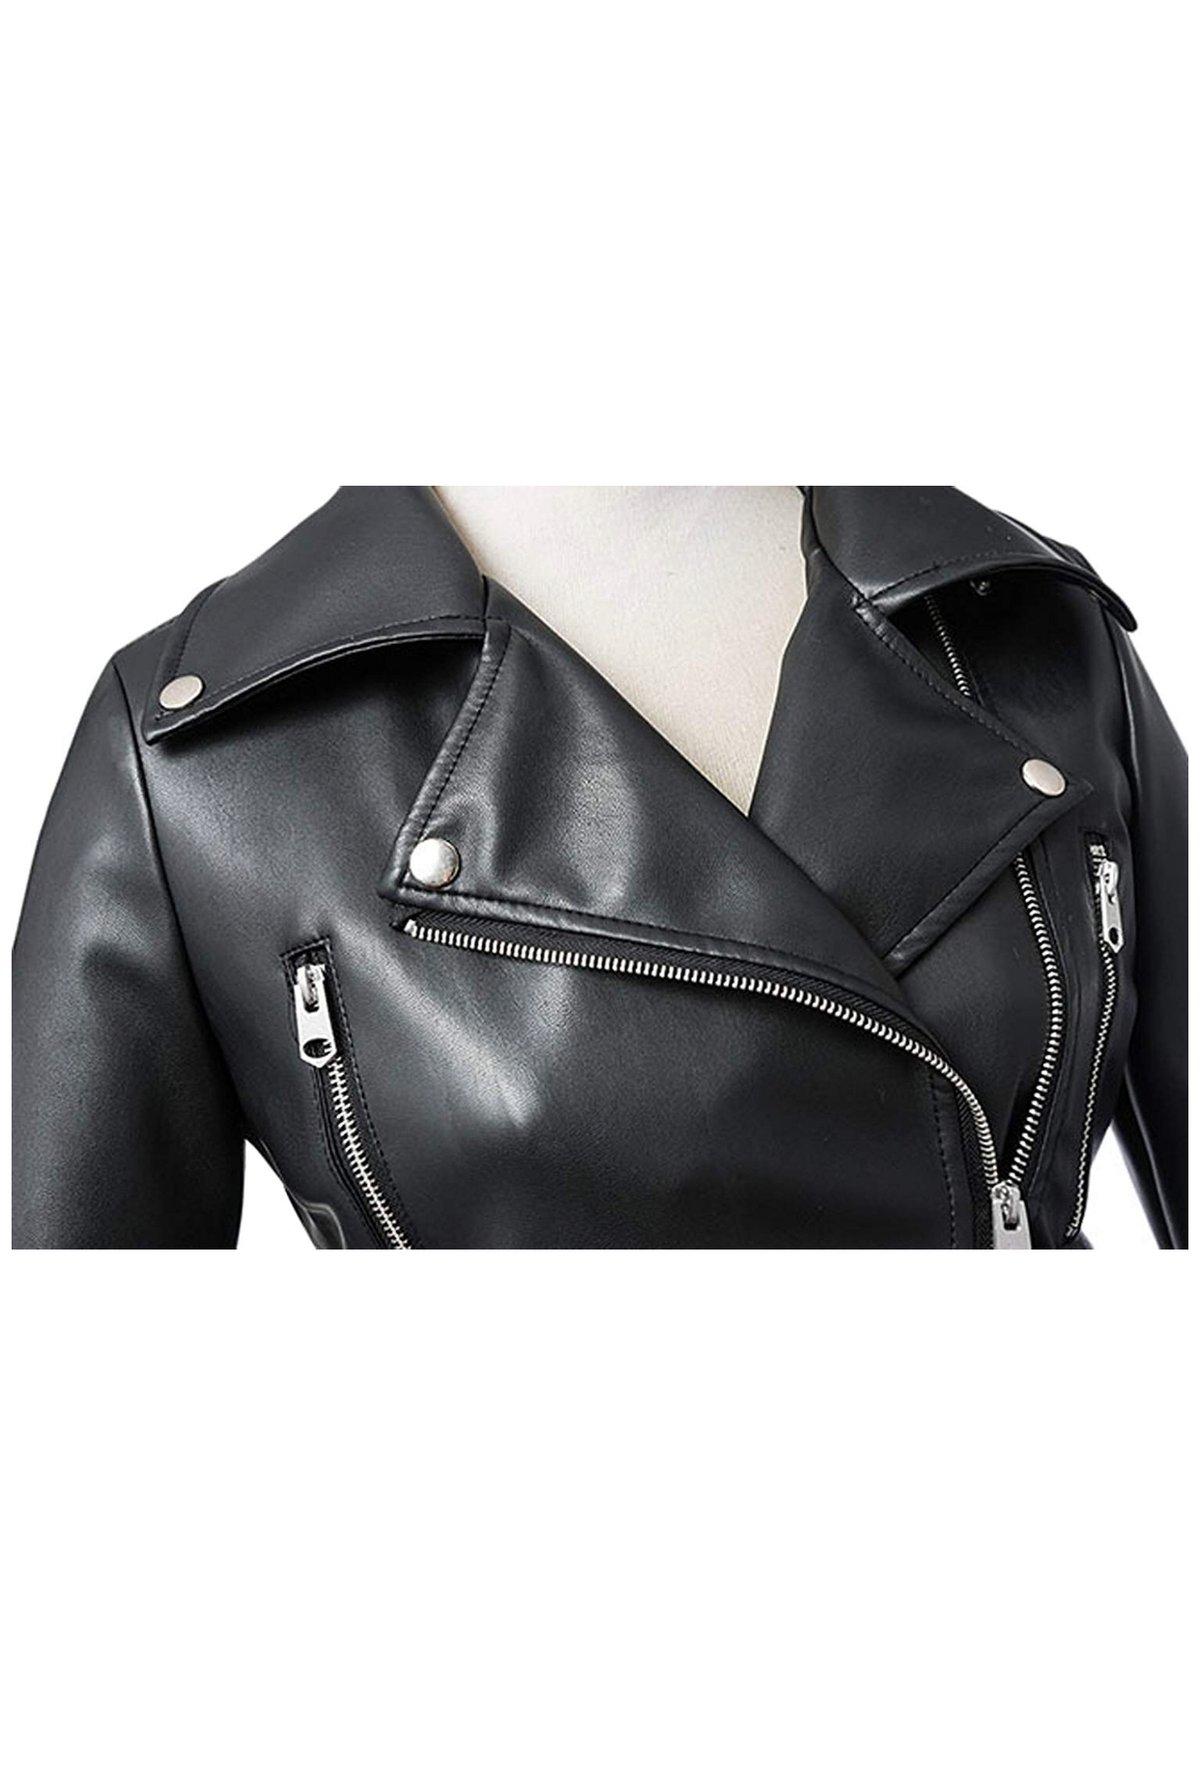 Image of Women's Custom Order Jacket